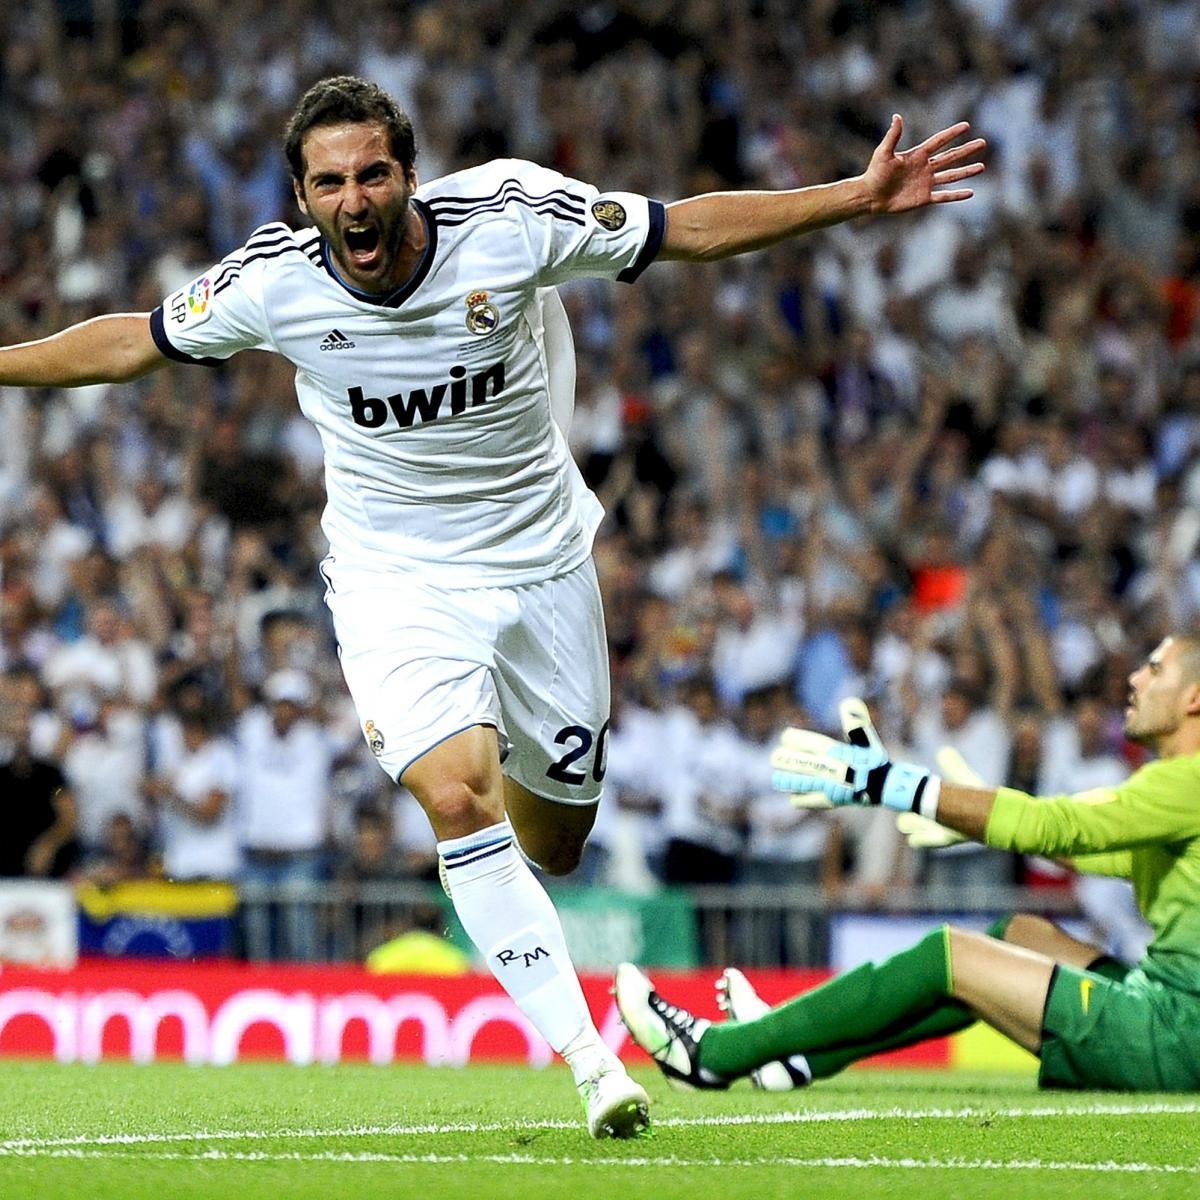 Cristiano Ronaldo S 4 Goals Lead Real Madrid To Win Vs: Real Madrid Vs. Barcelona: Spanish Super Cup Live Blog